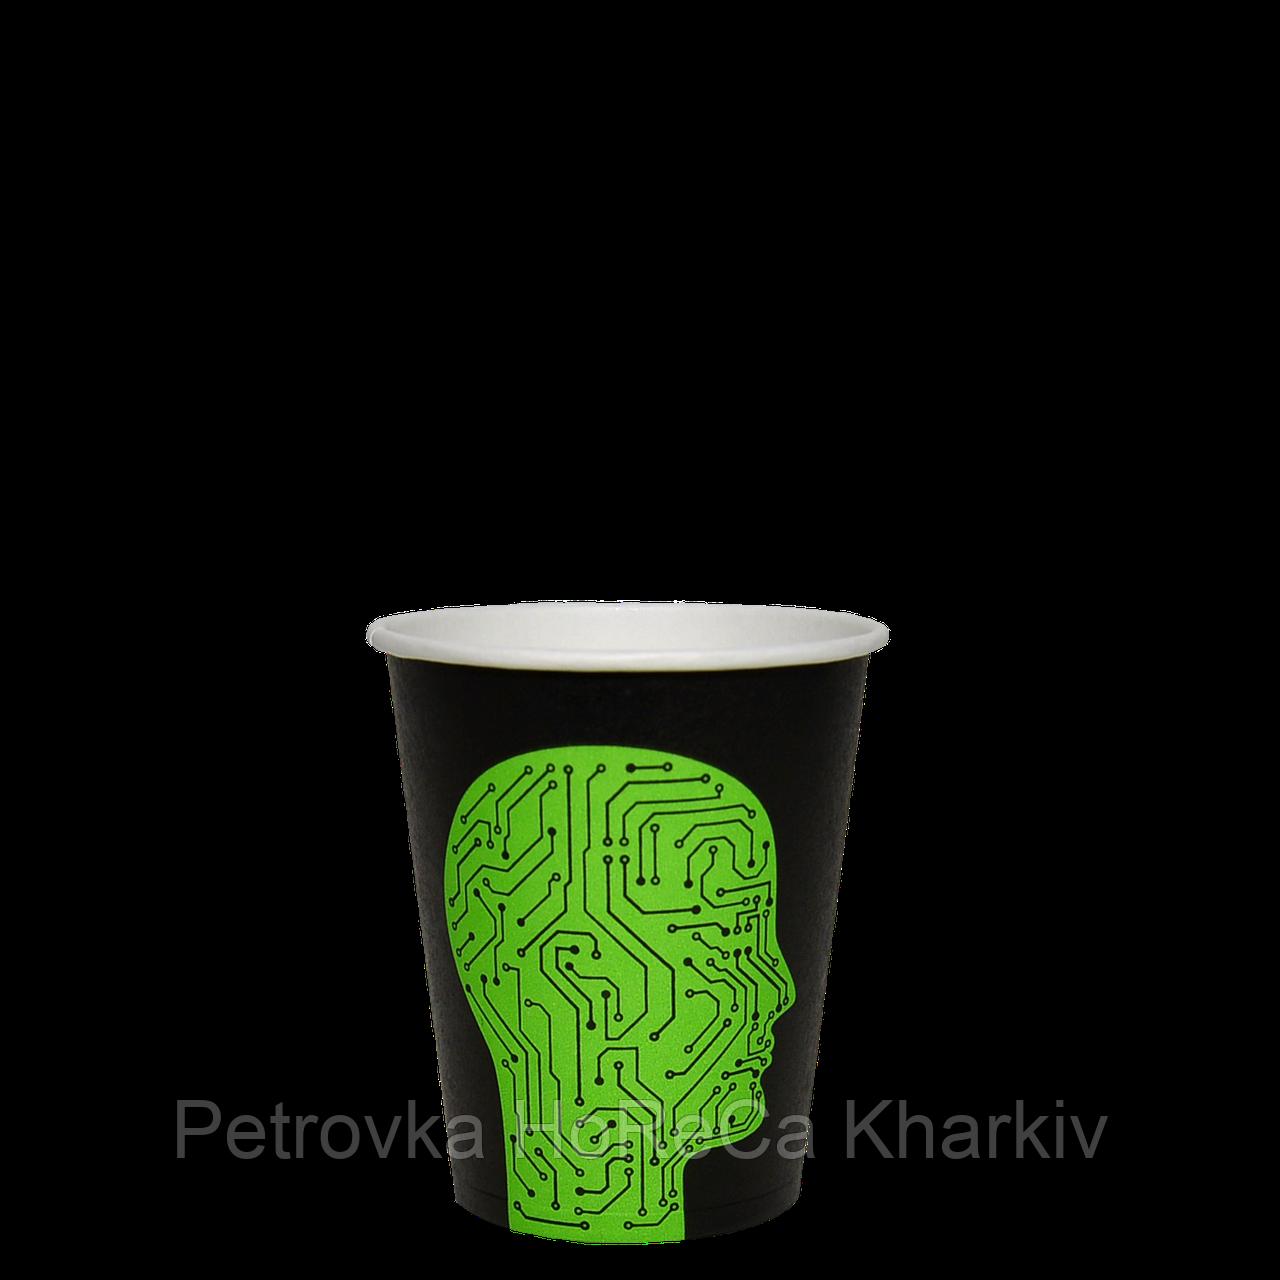 "Одноразовый стакан, серия ""Проскануй"", 175мл. 50шт/уп (1ящ/20уп/1000шт) под крышку КВ71/""РОМБ"" 71, фото 1"